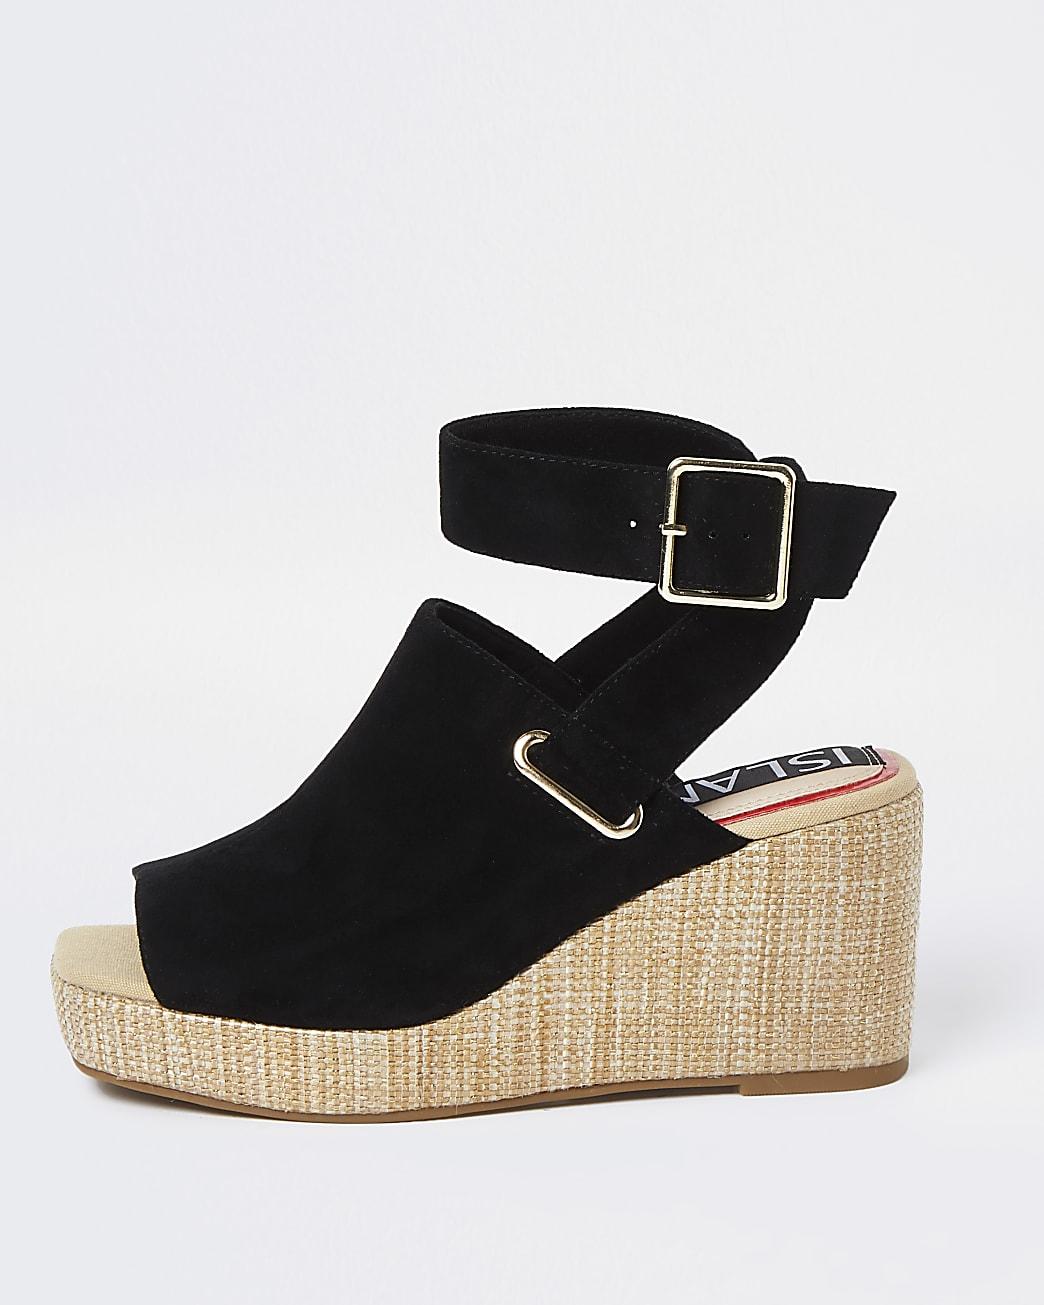 Black wedge shoe boots